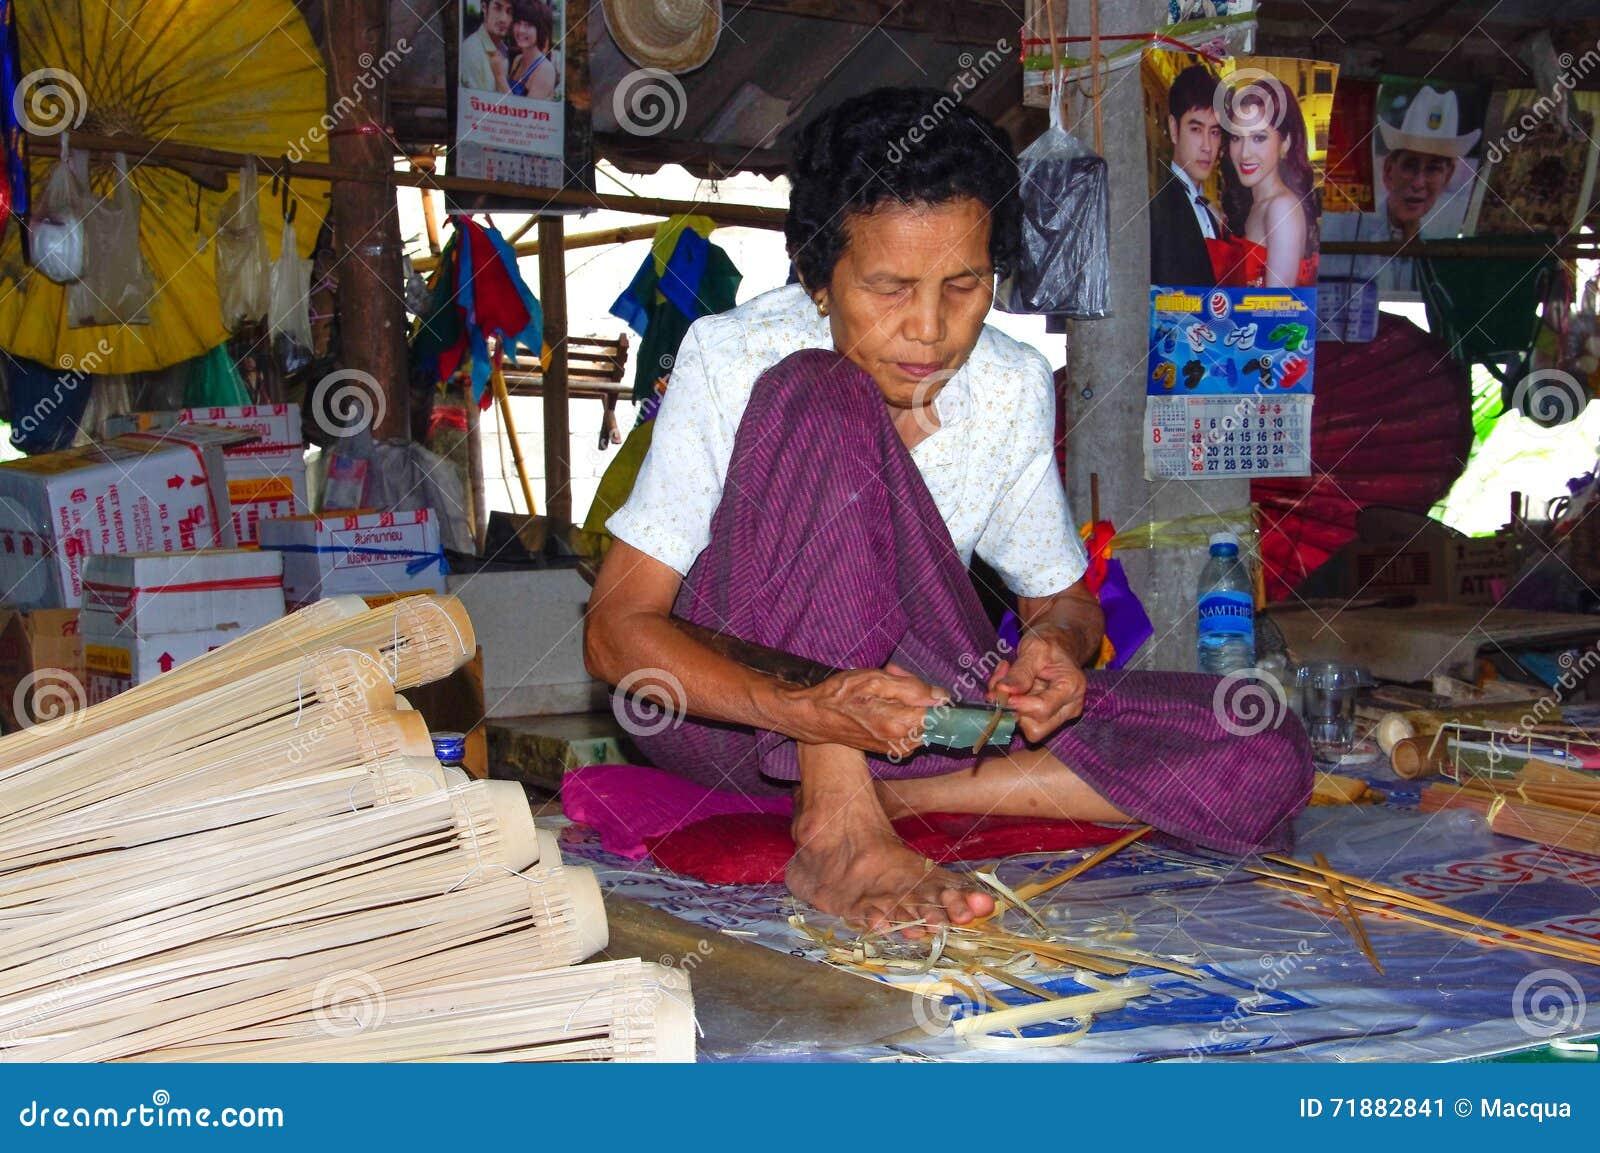 Thailand - Chiang Mai - Bamboo - Umbrella woman - handmade